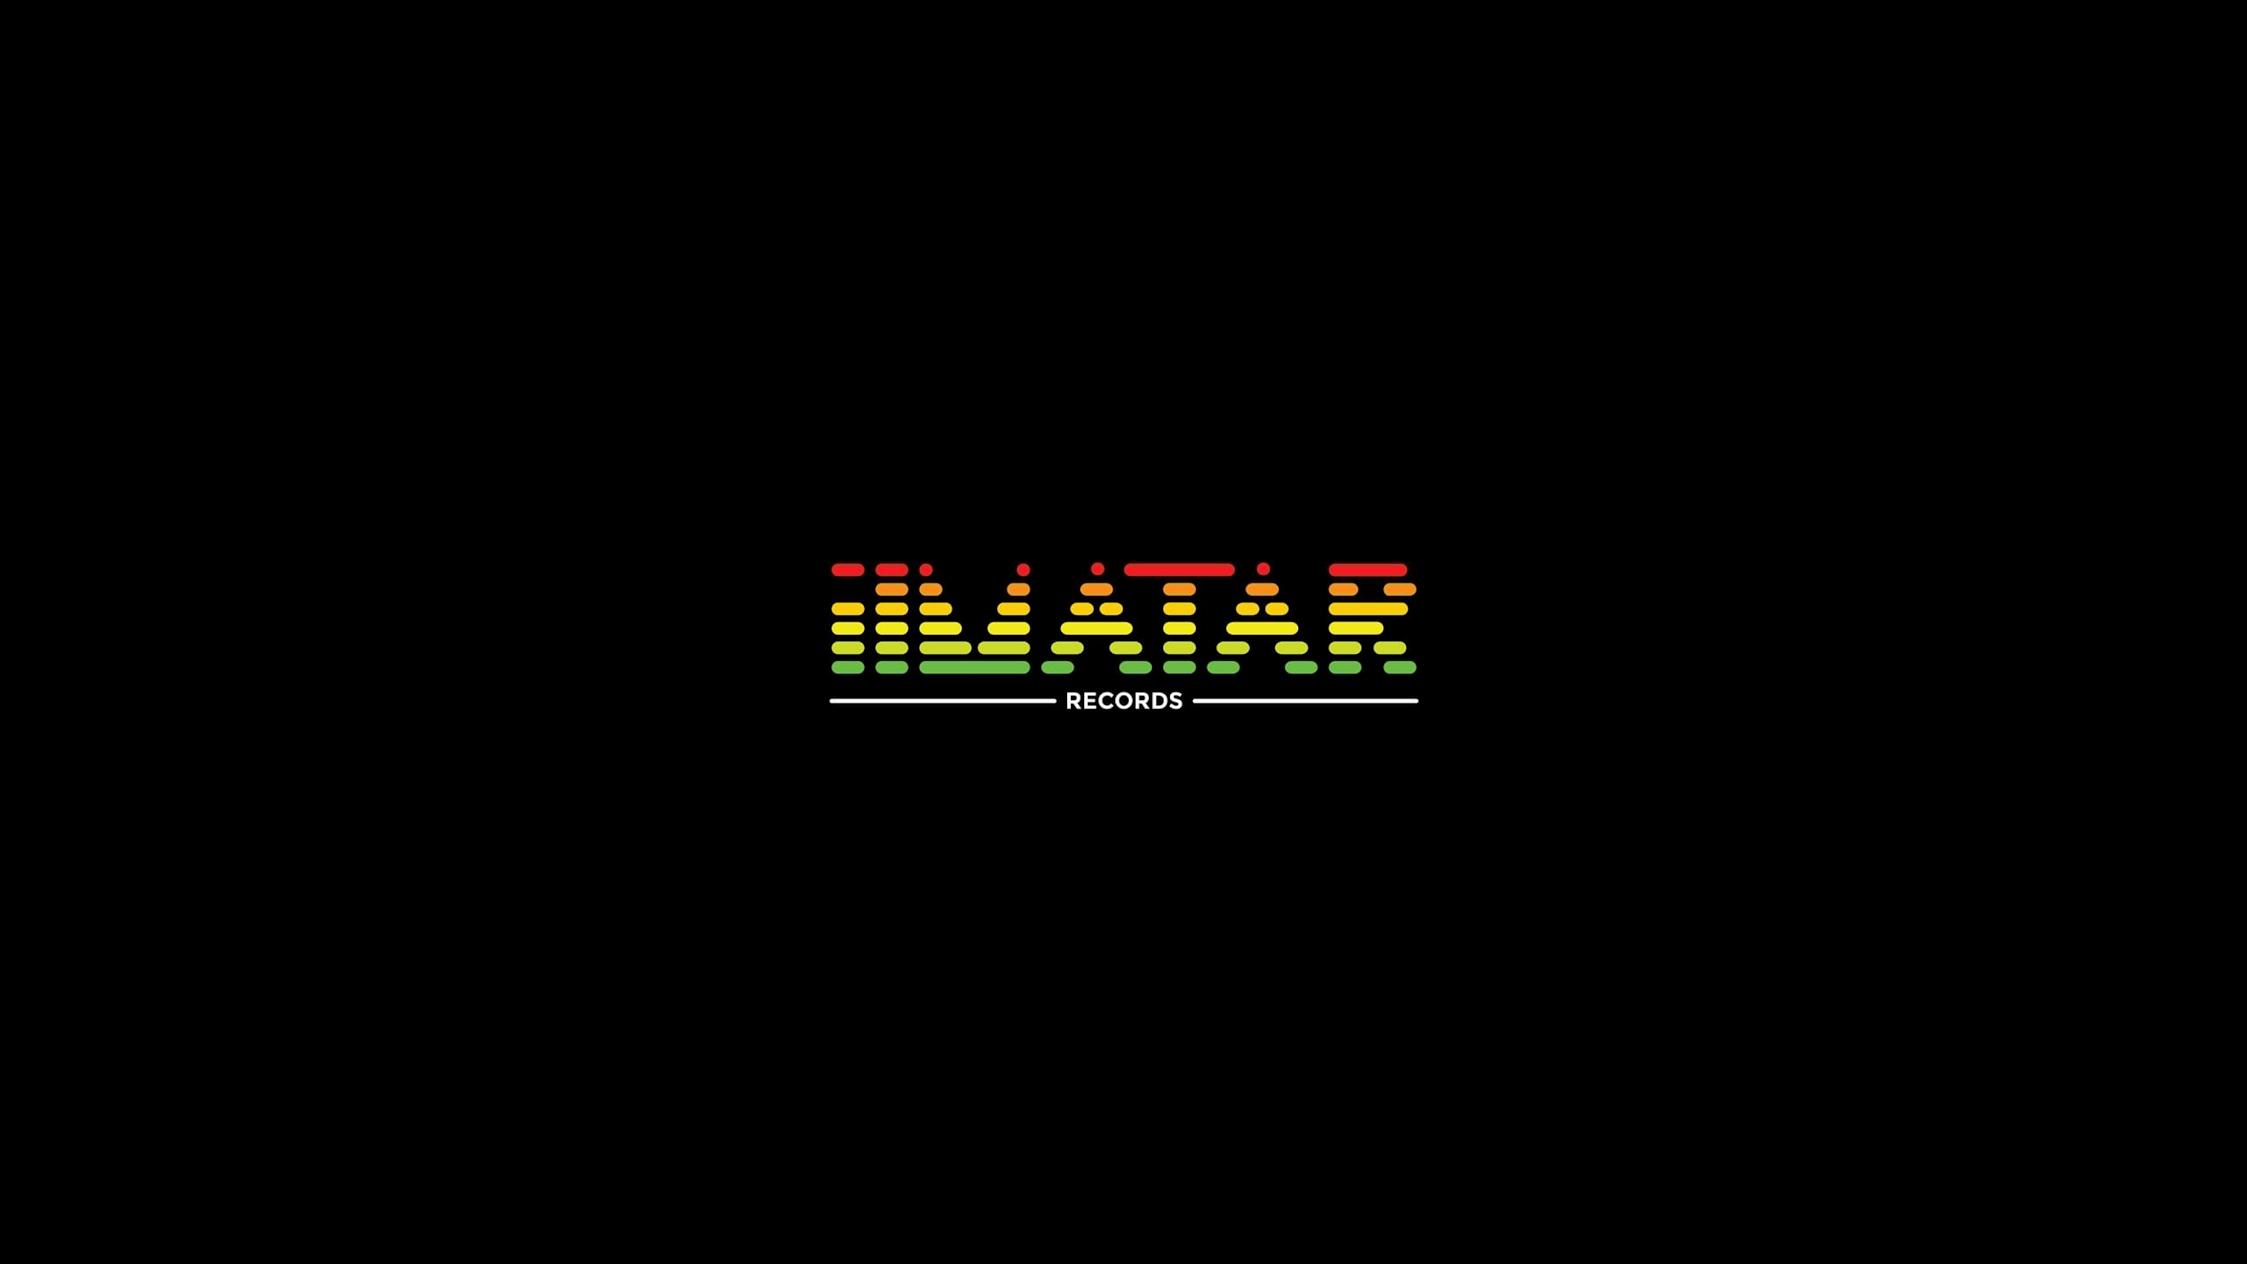 iLMATAR Records